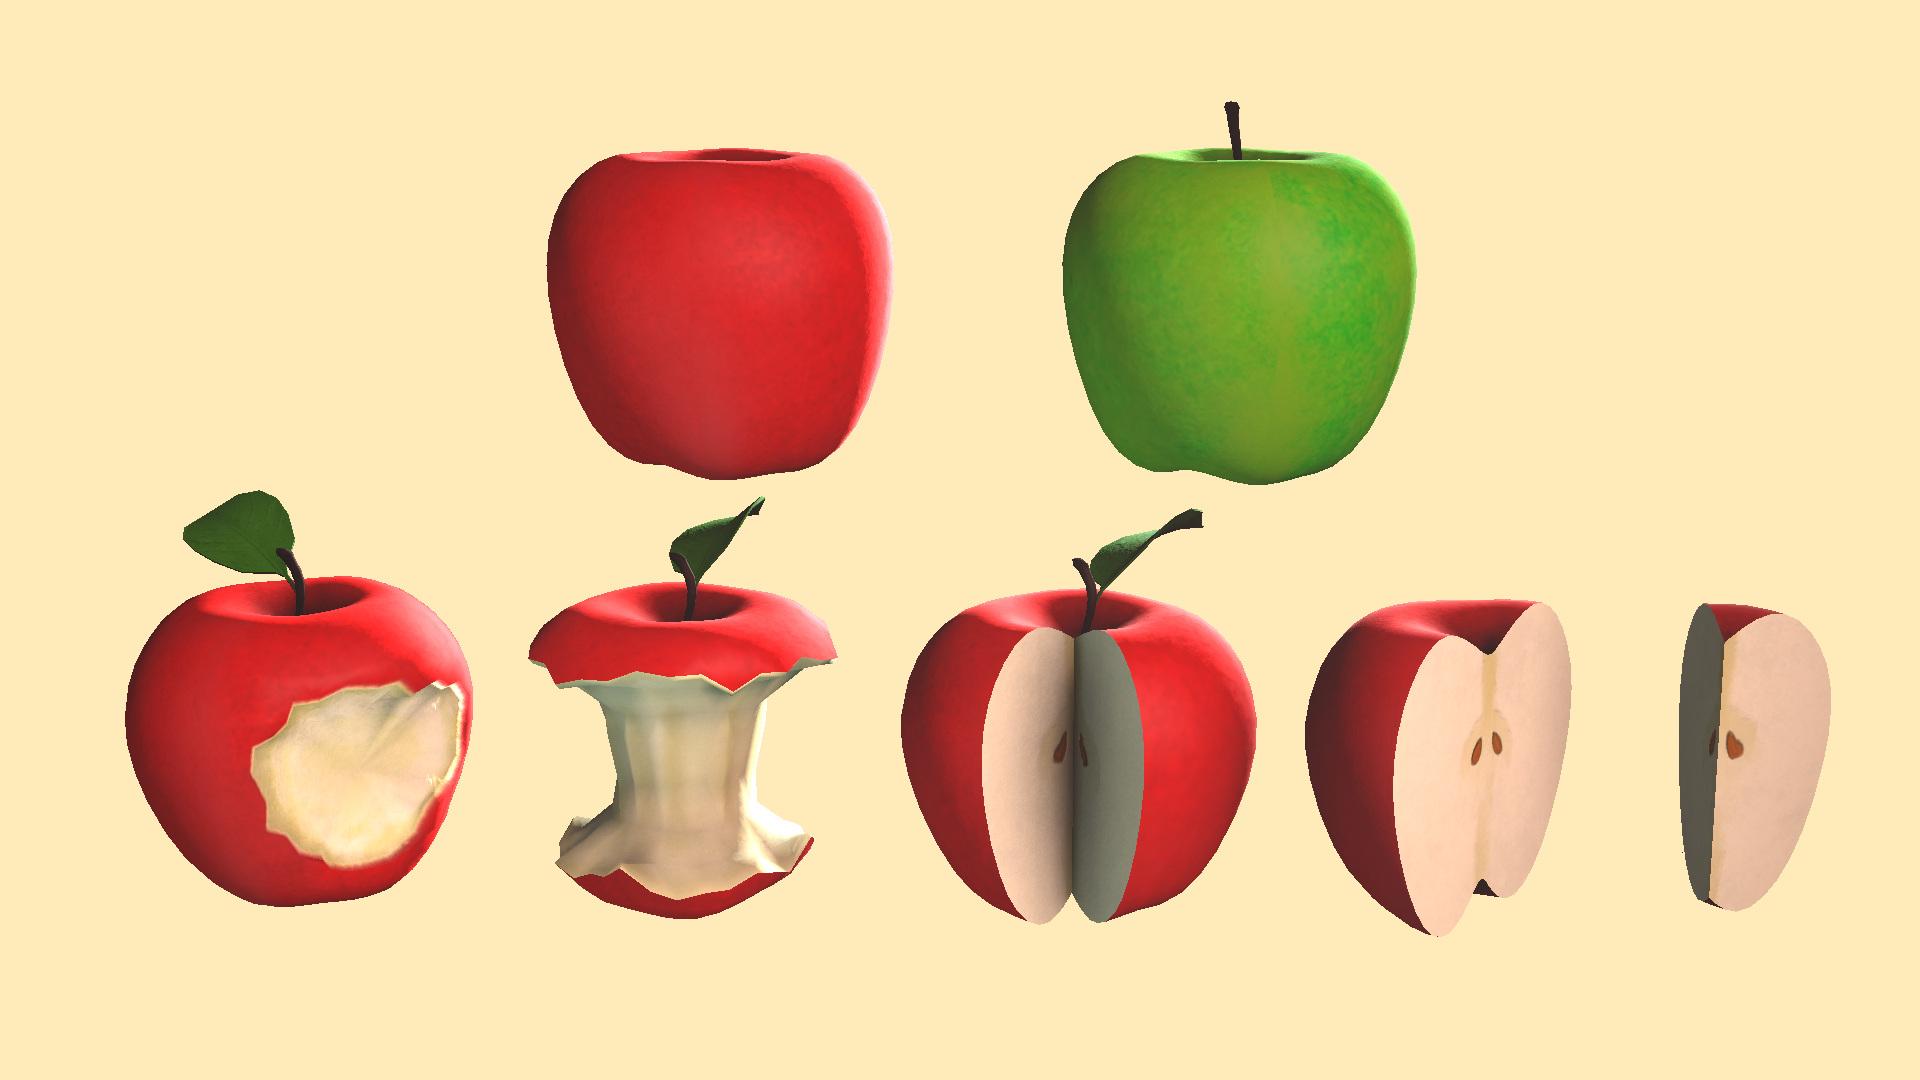 736822415_preview_apples_tnr